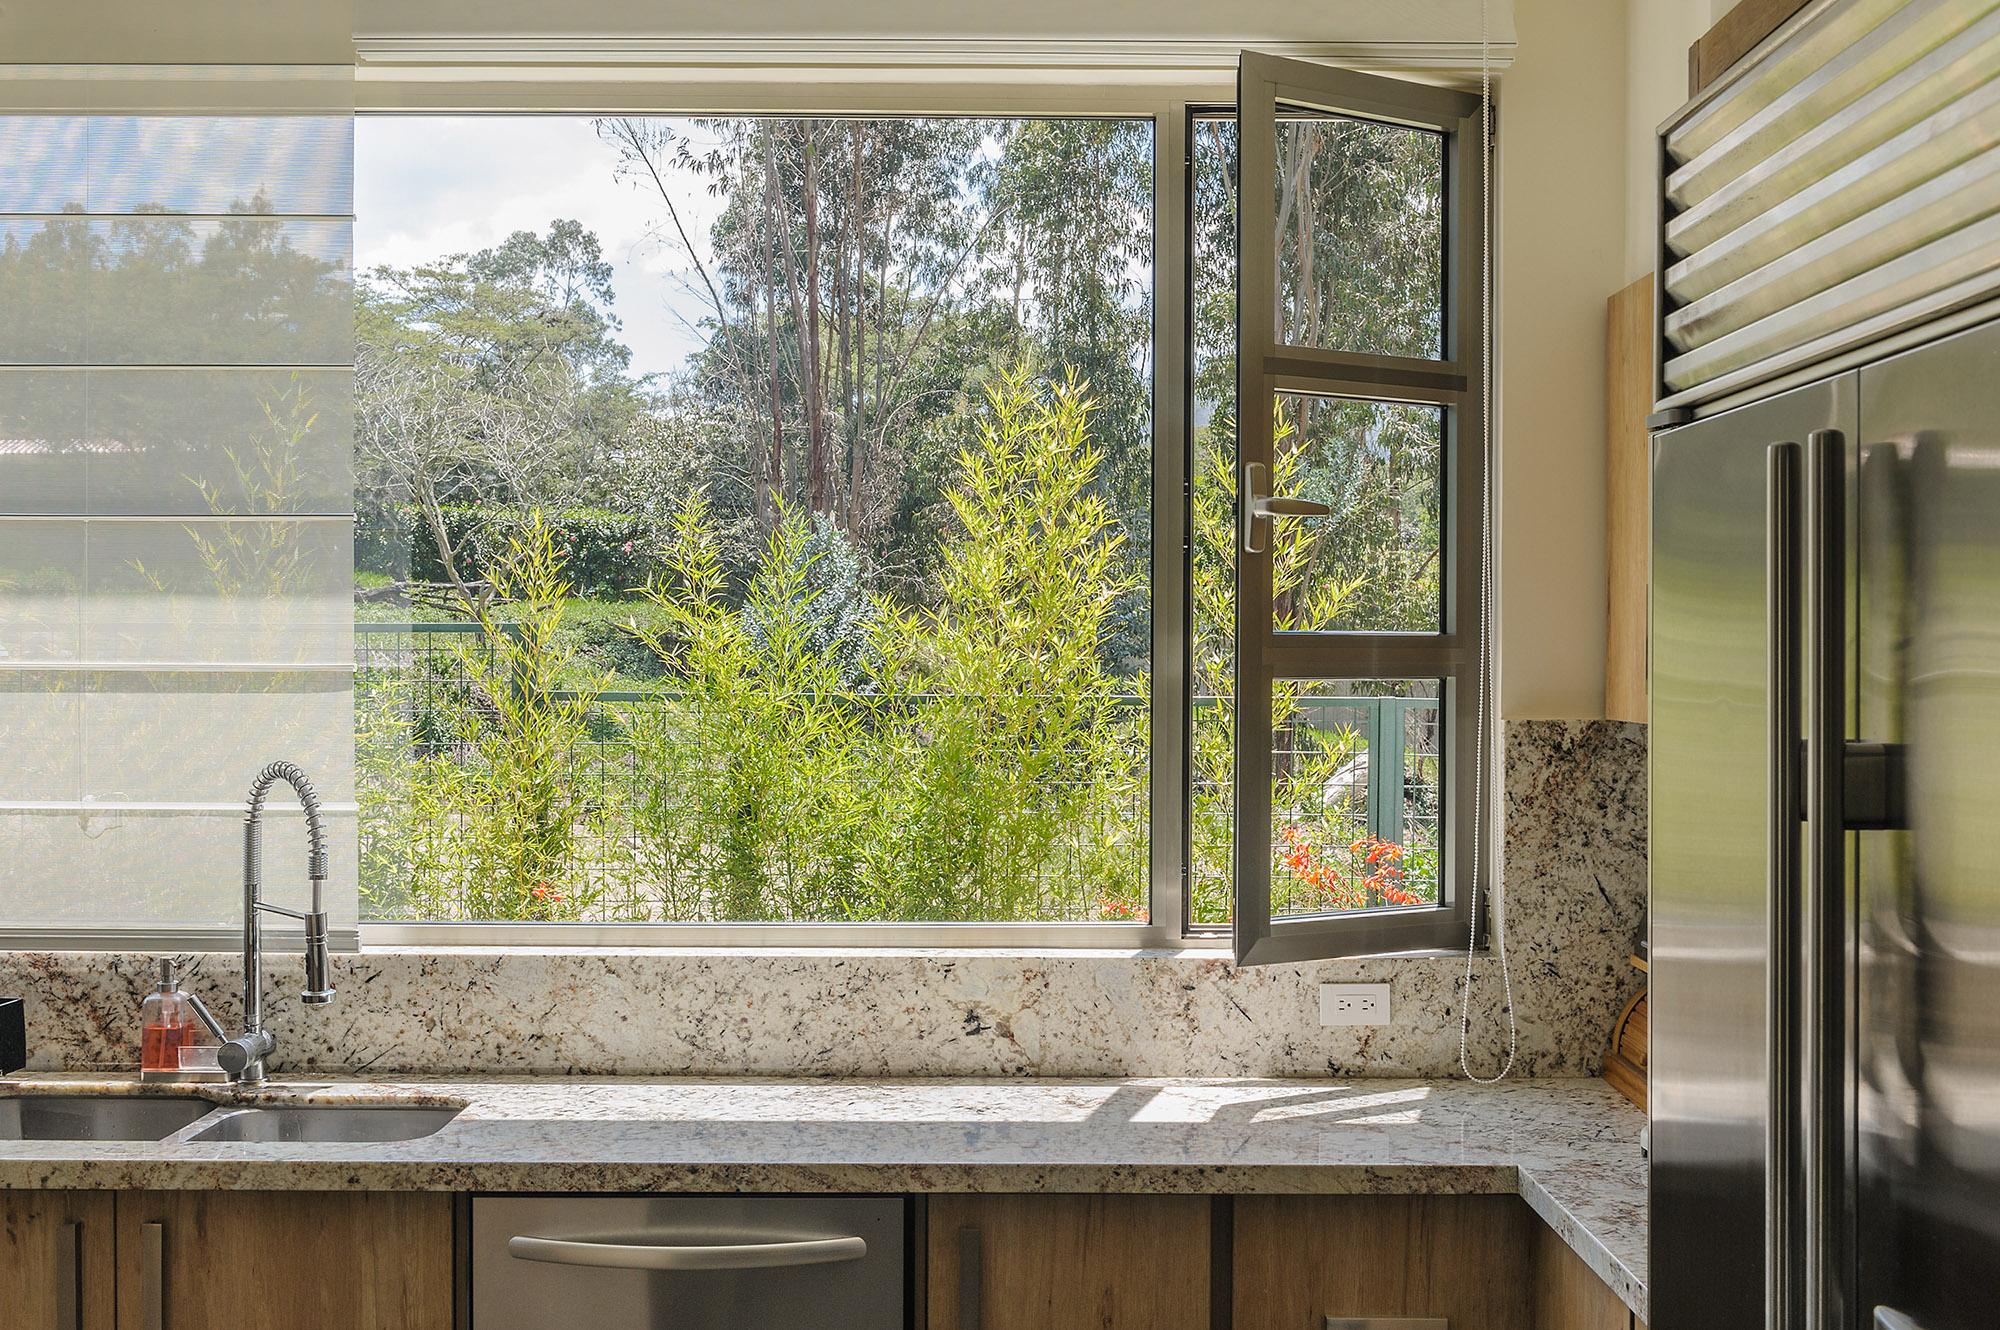 Nítida vista a través de ventana oscilobatiente de cocina